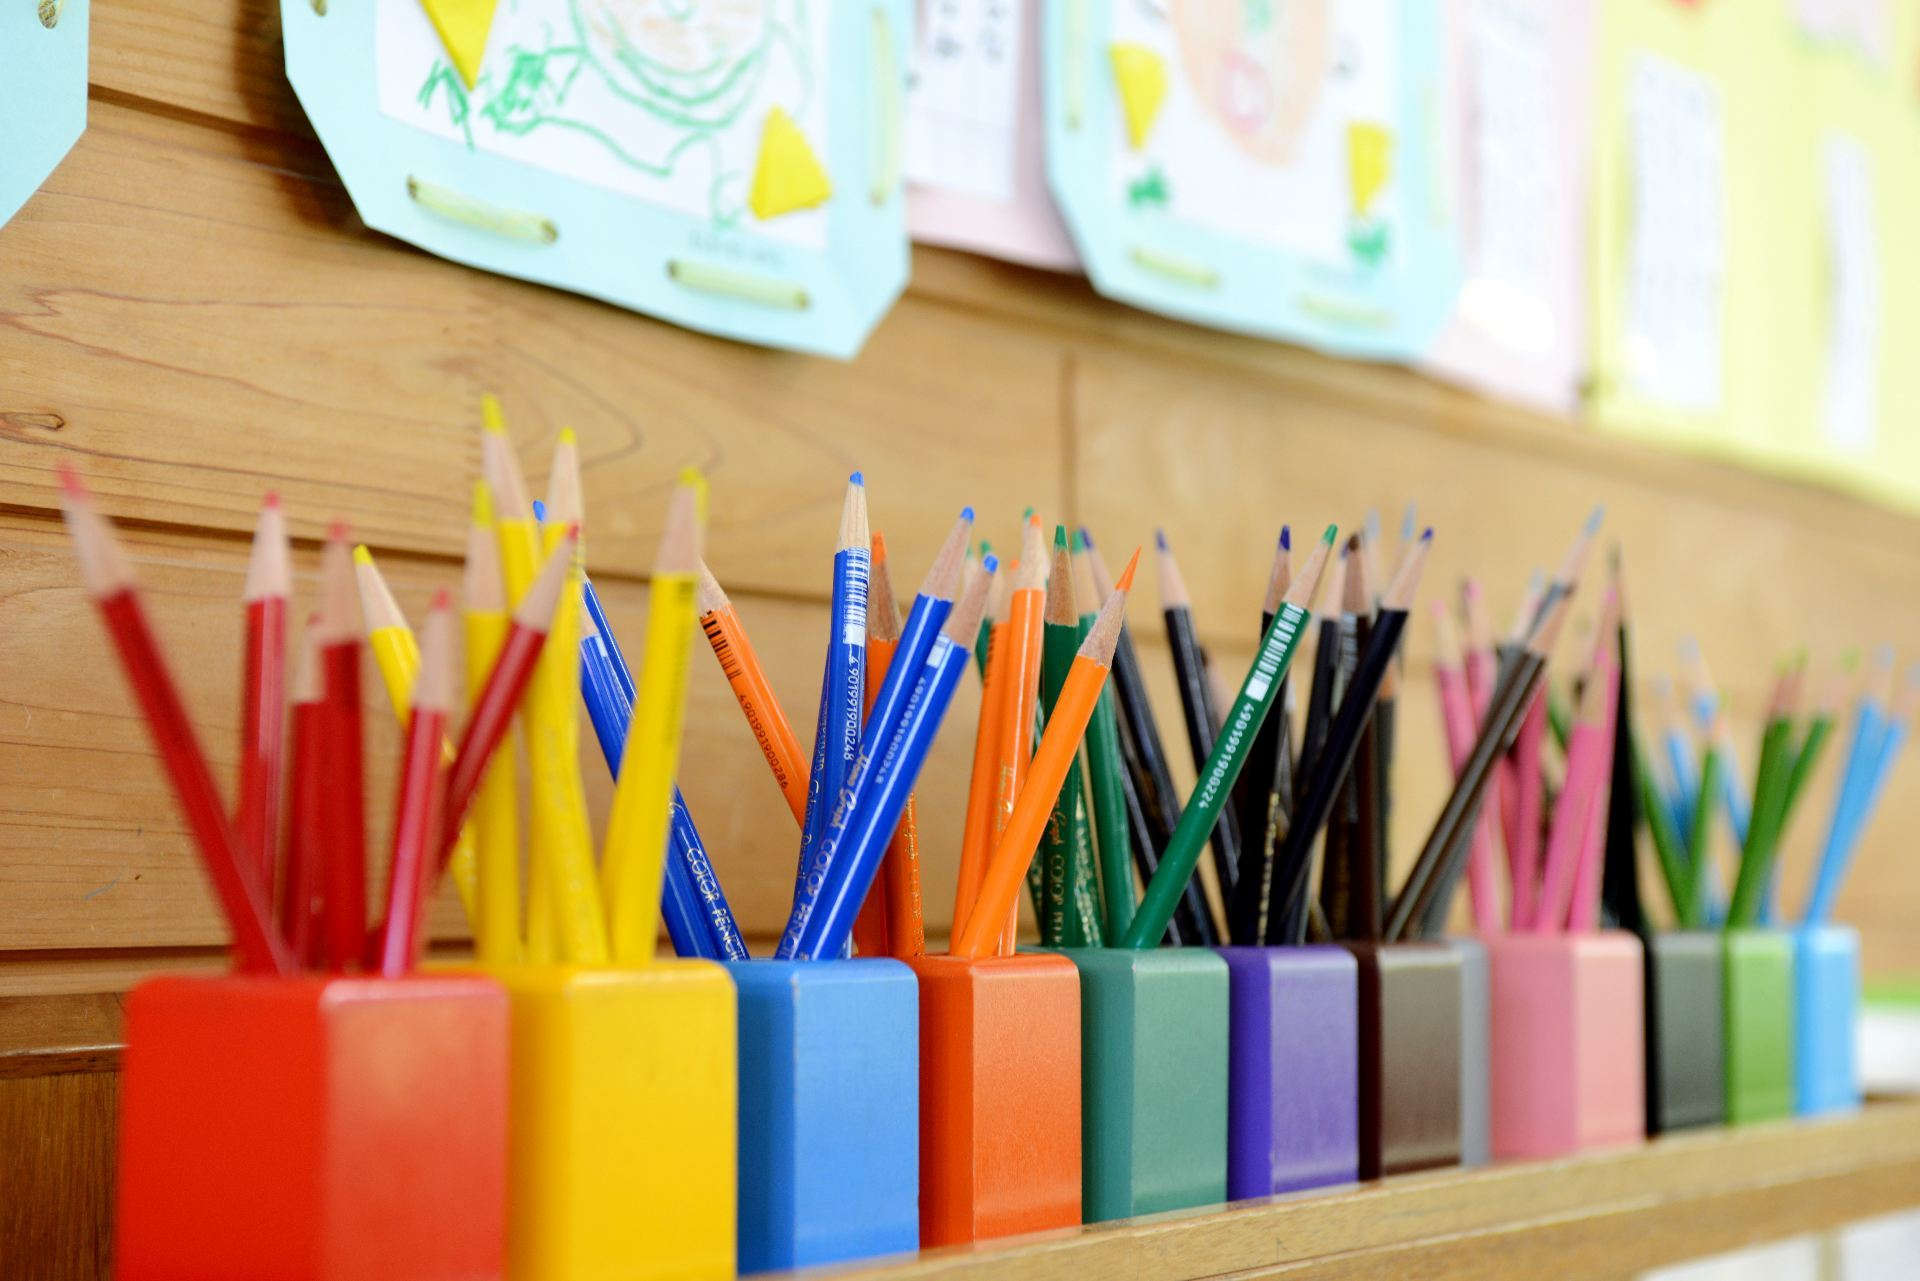 Pencils in classroom